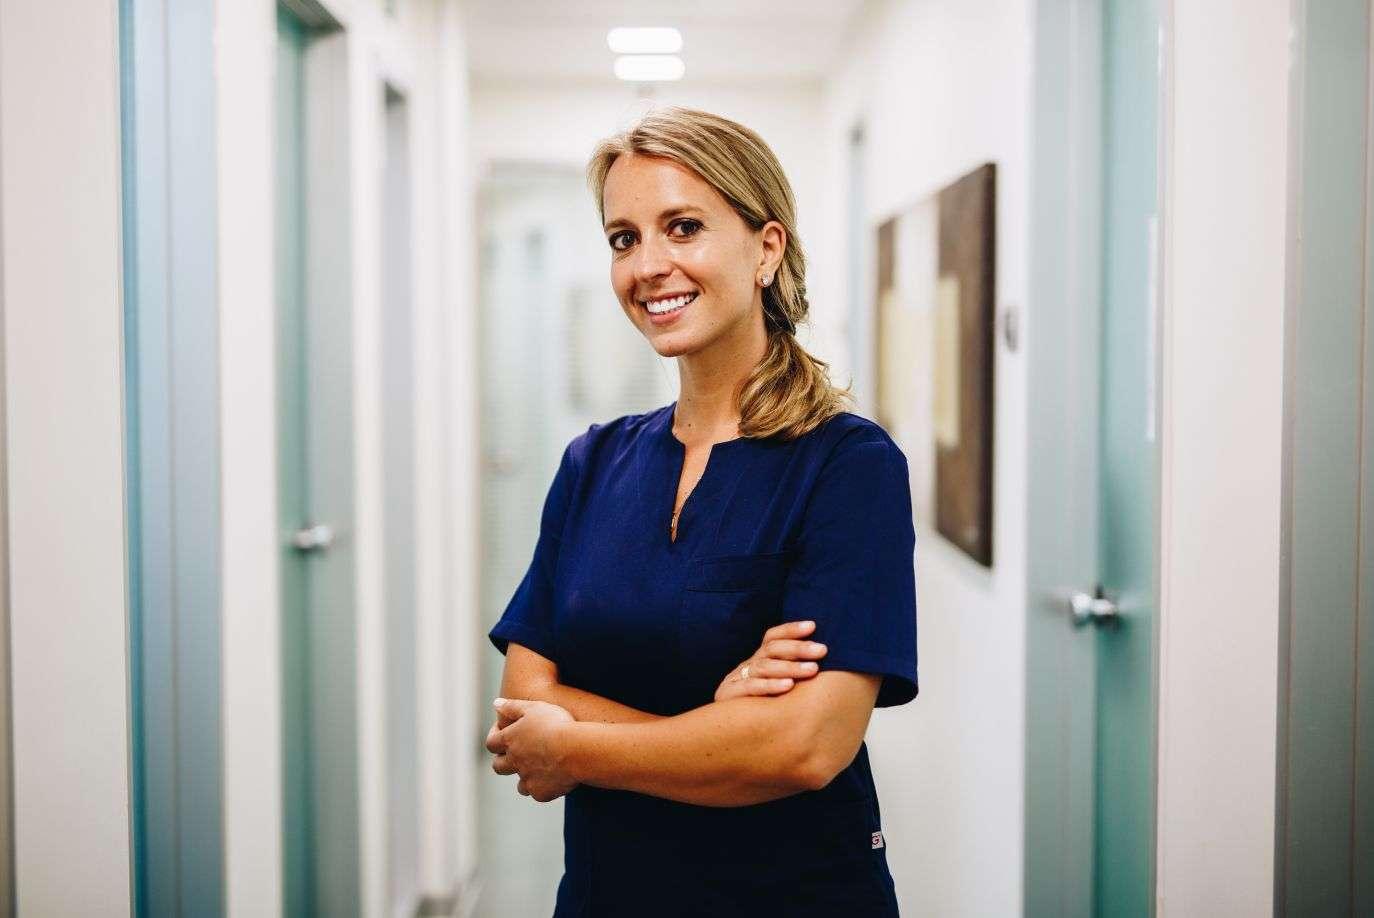 Dentista, la dottoressa Clotilde Austoni